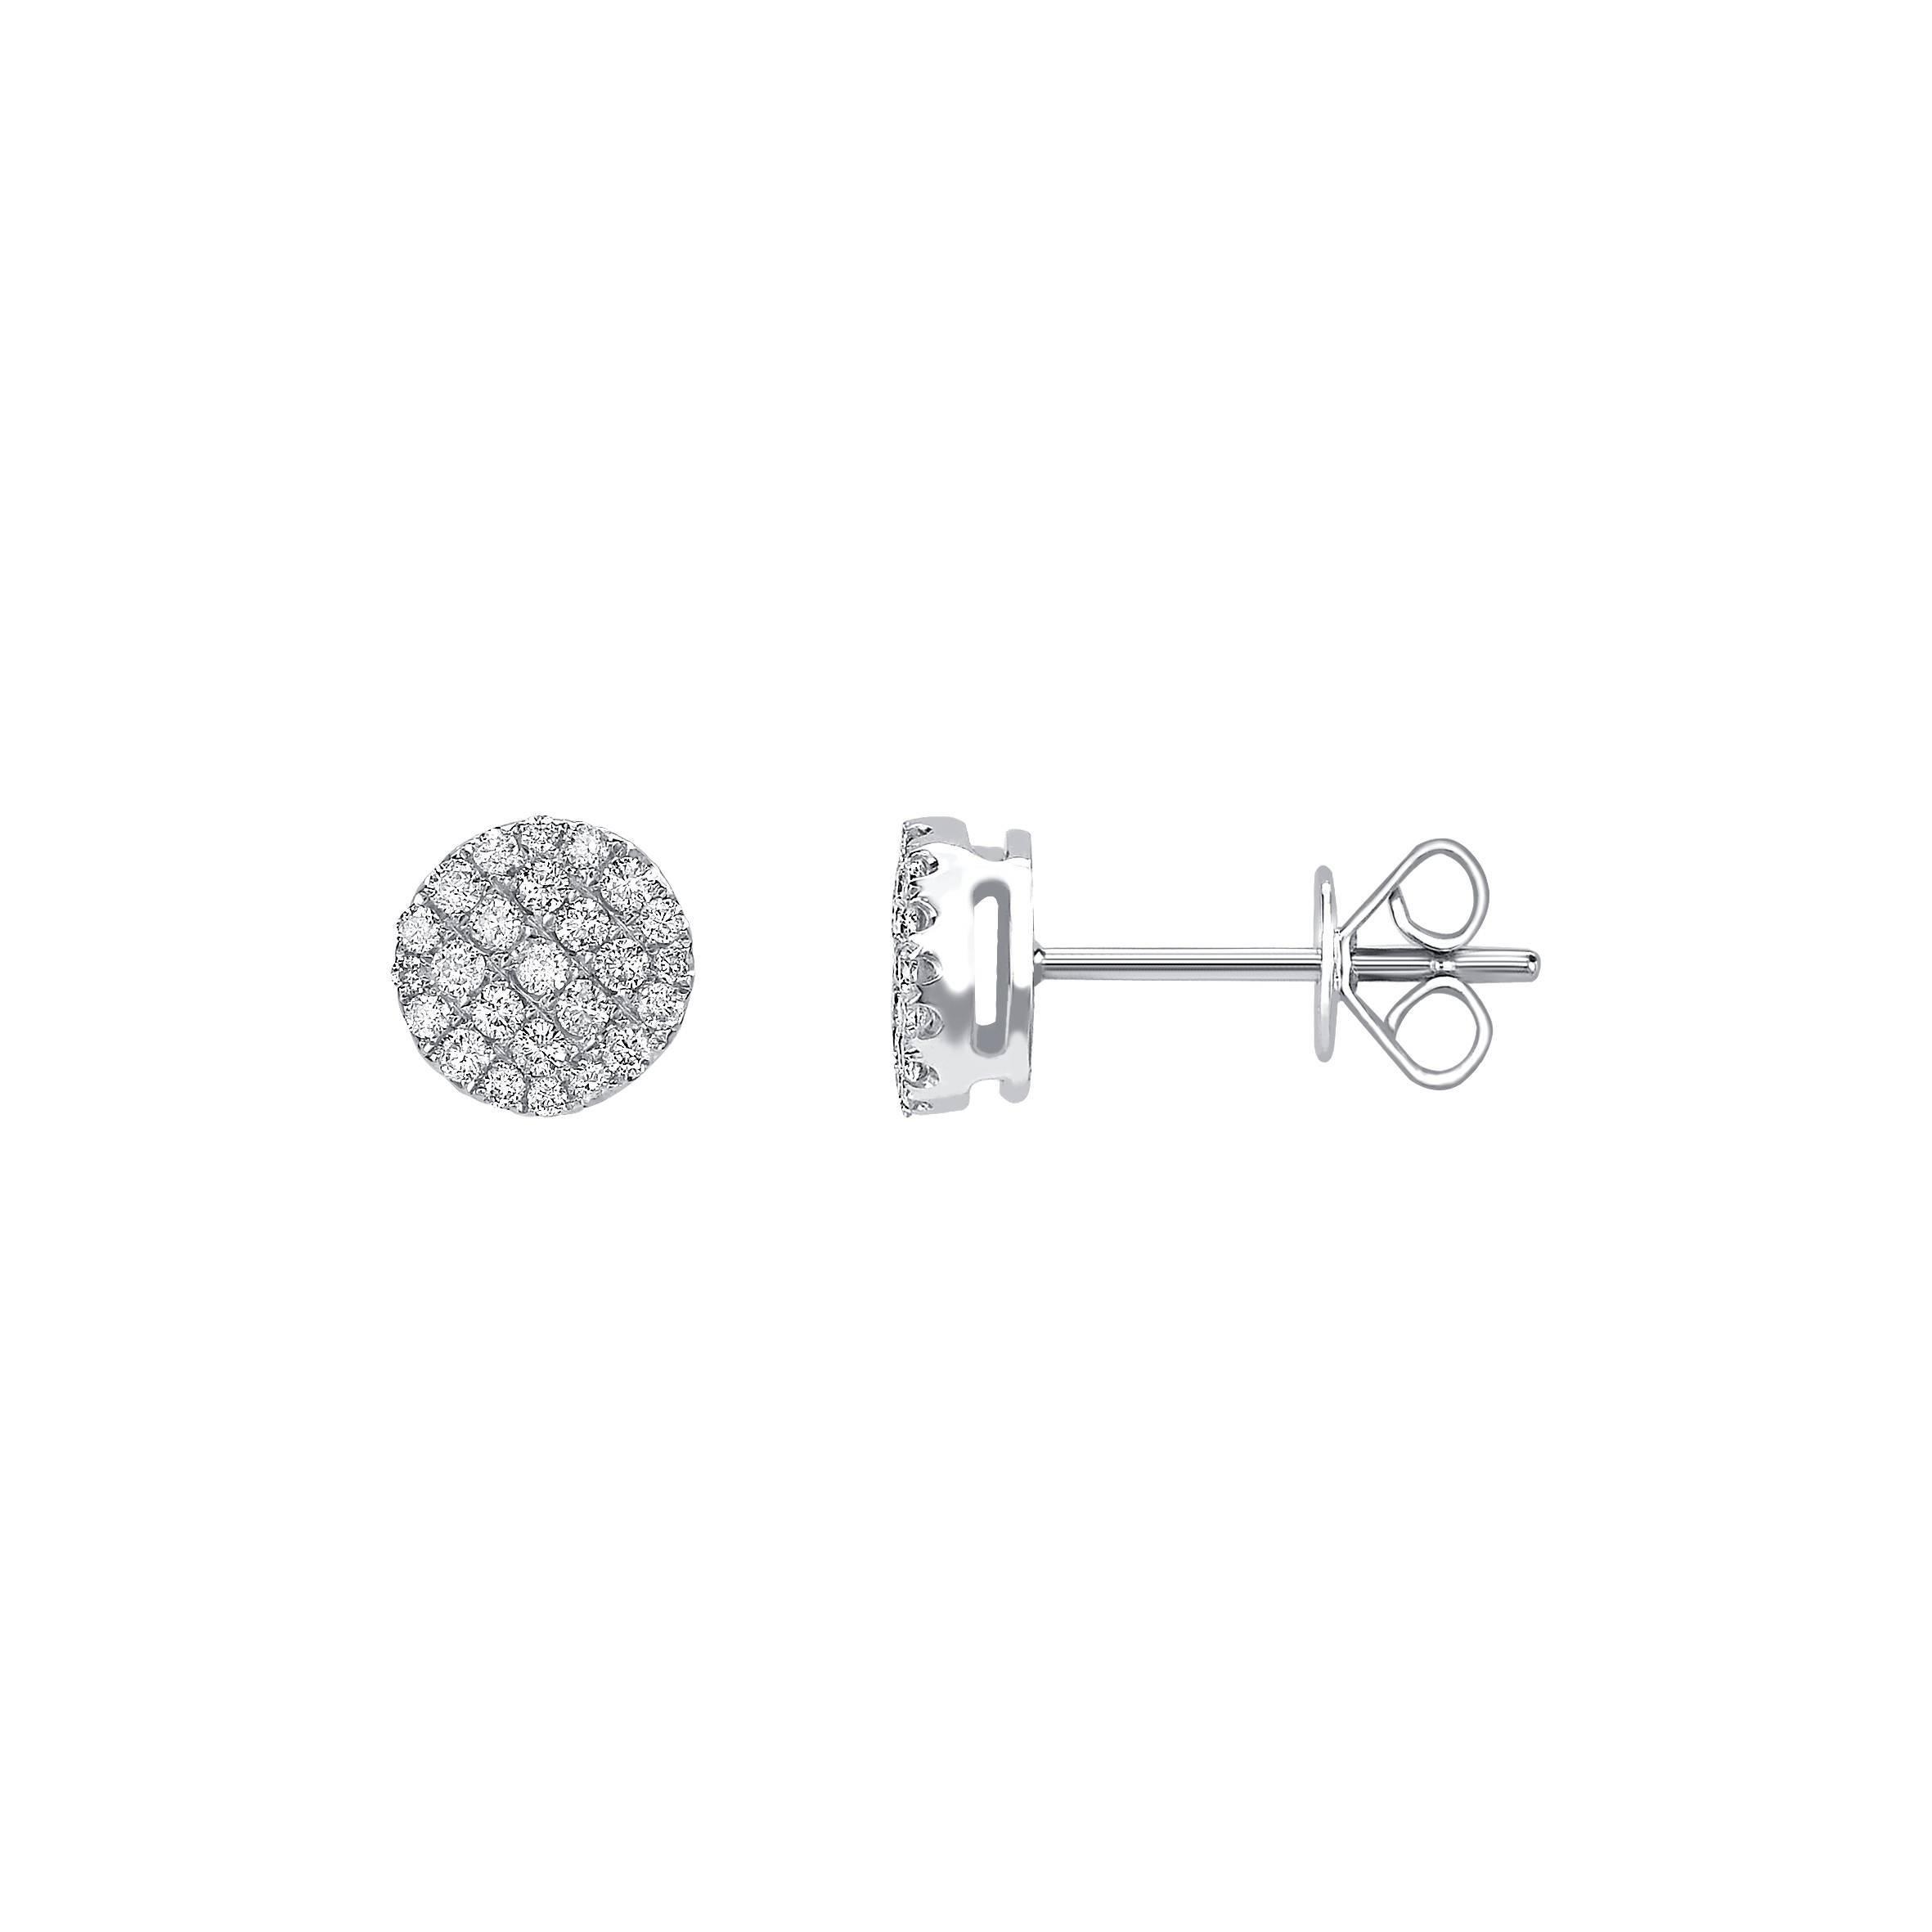 0.50 Carat Pave Set Cluster Round White Diamond 18K White Gold Stud Earrings